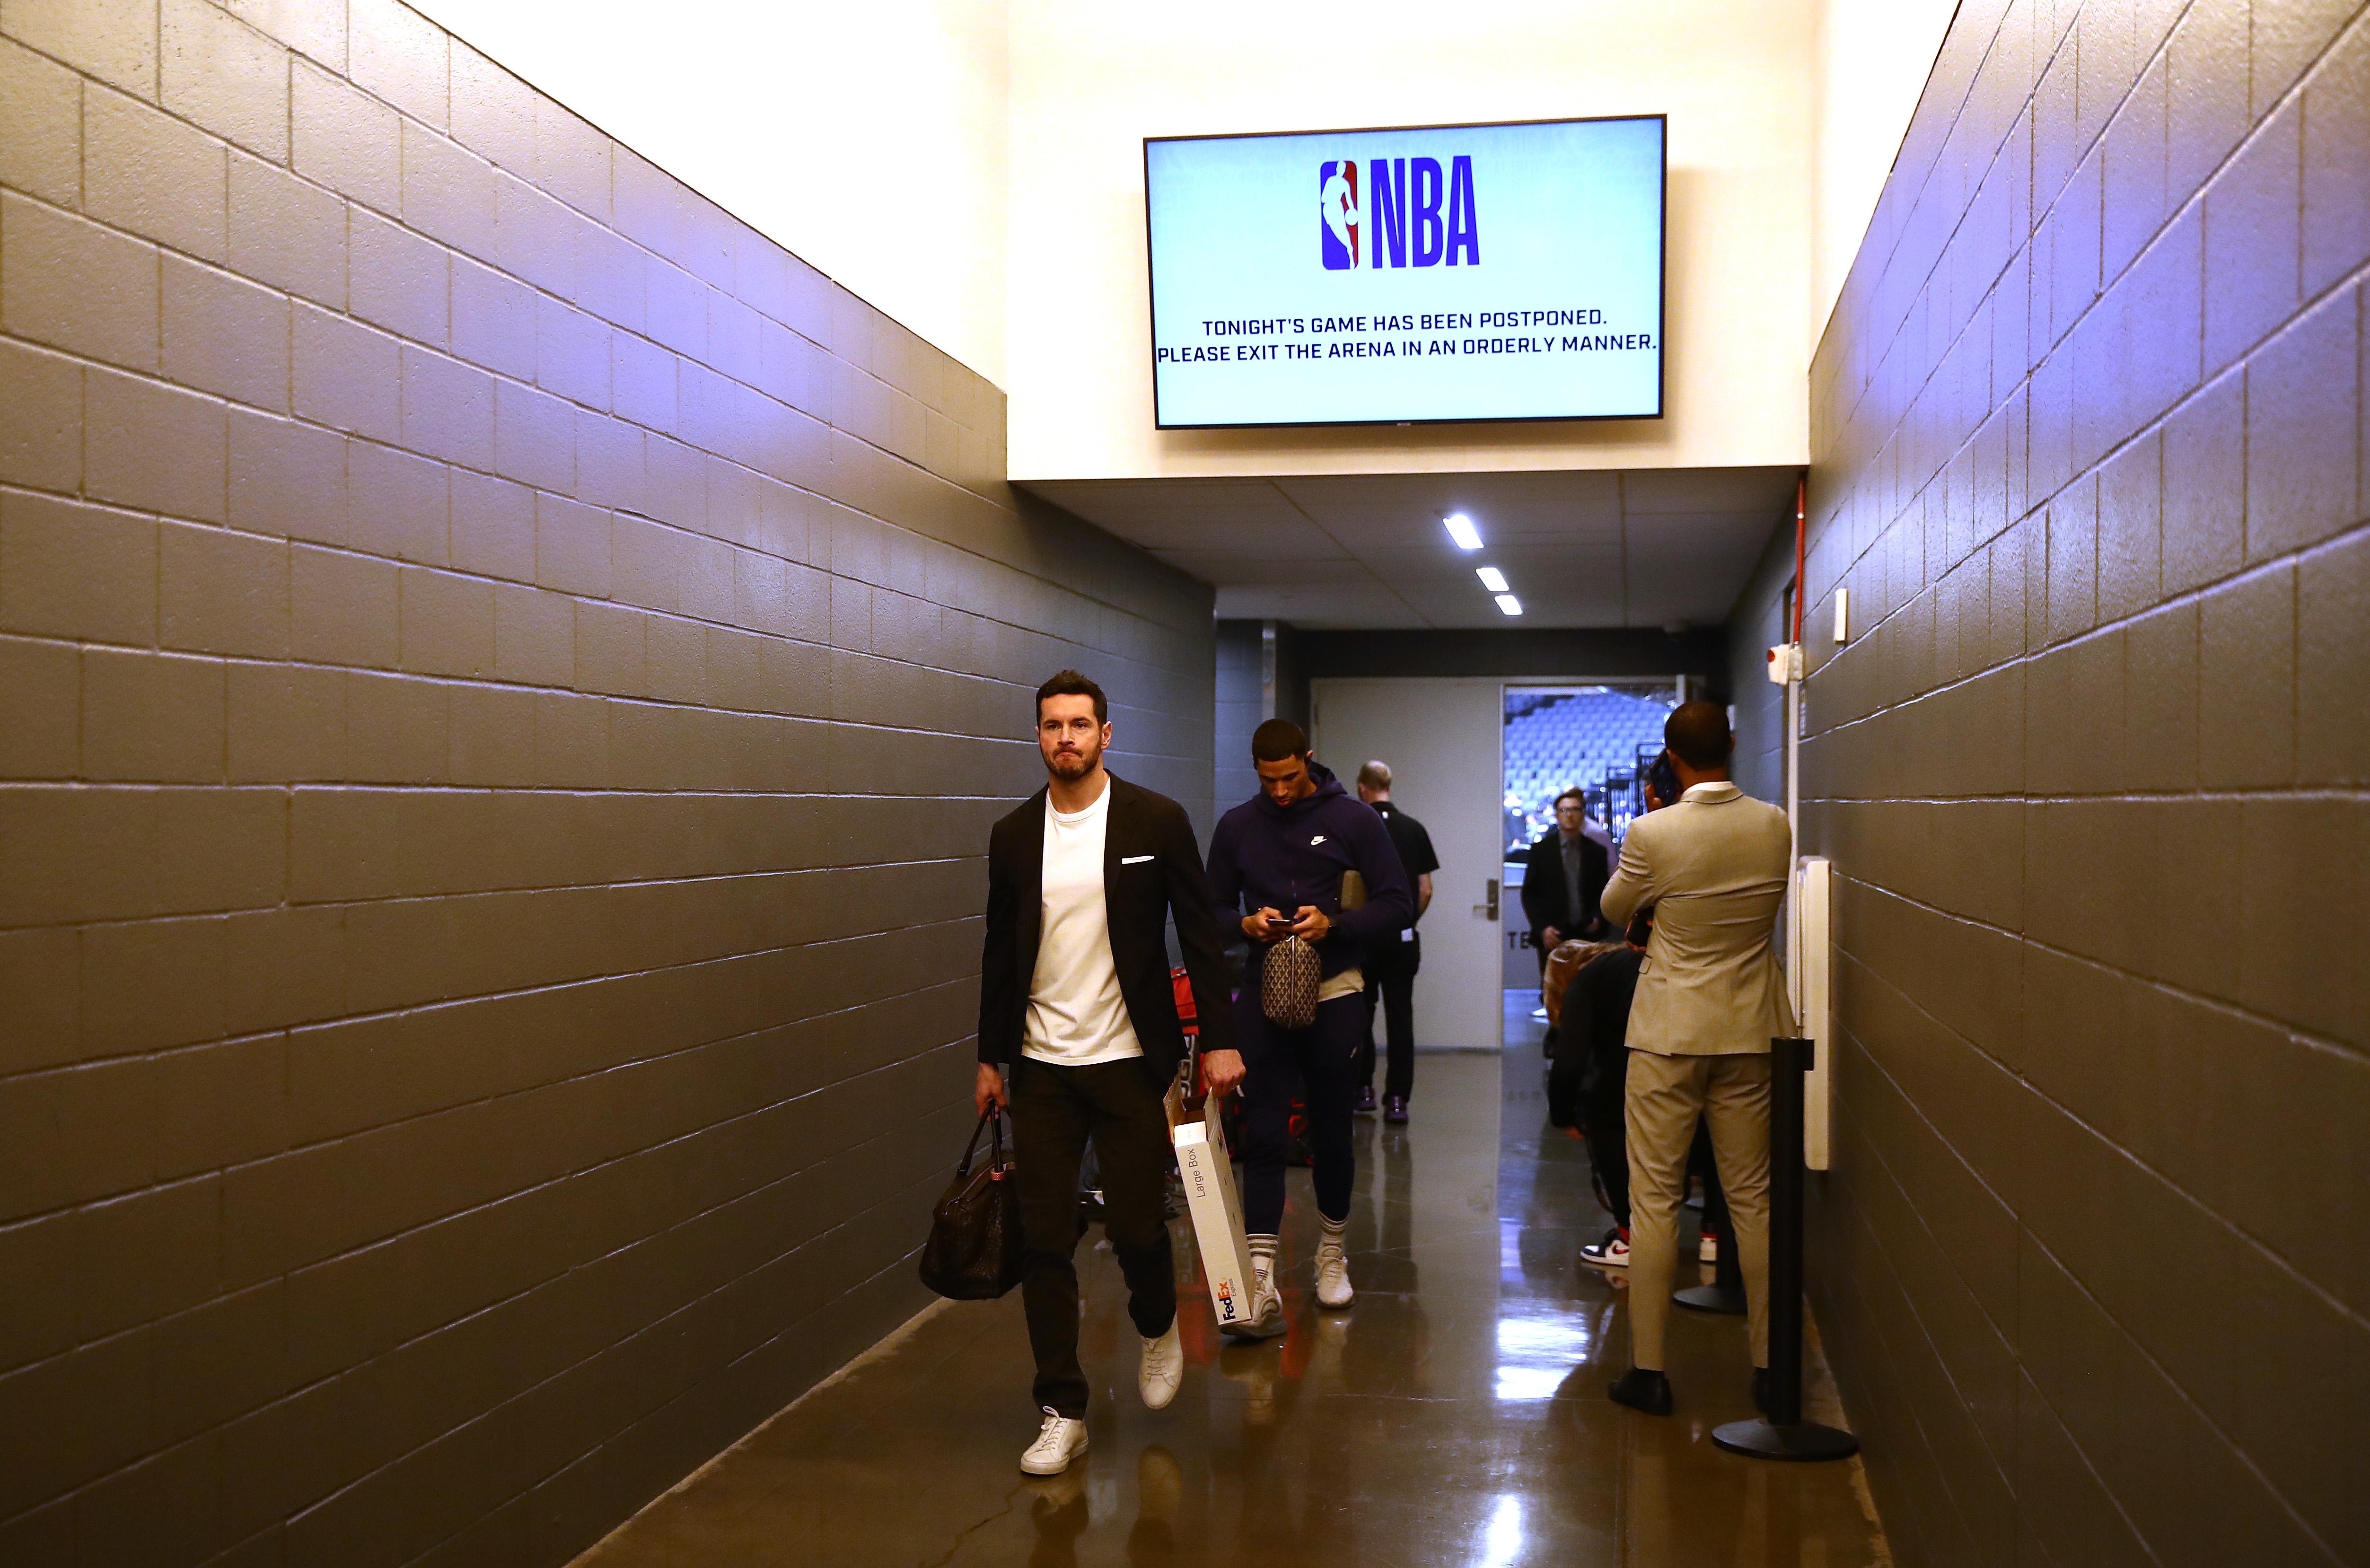 NBA player JJ Redick